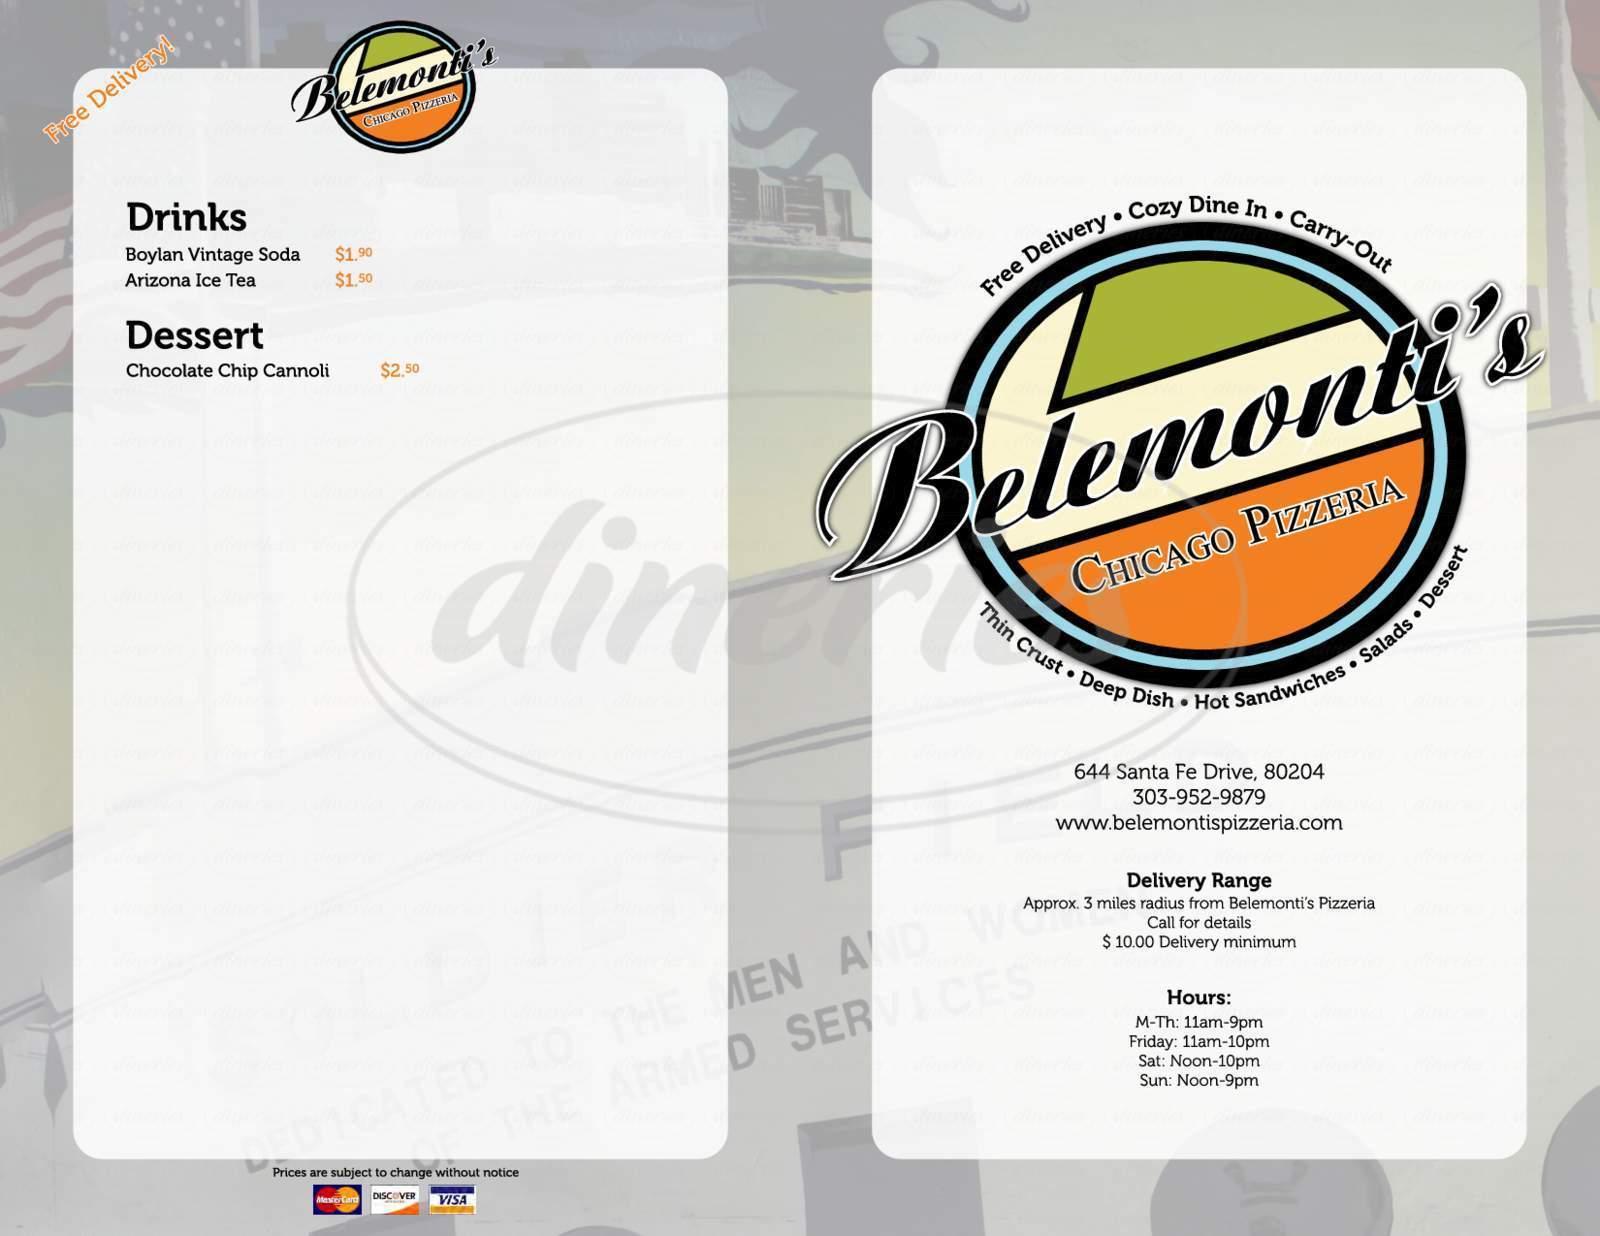 menu for Belemonti's Chicago Pizzeria